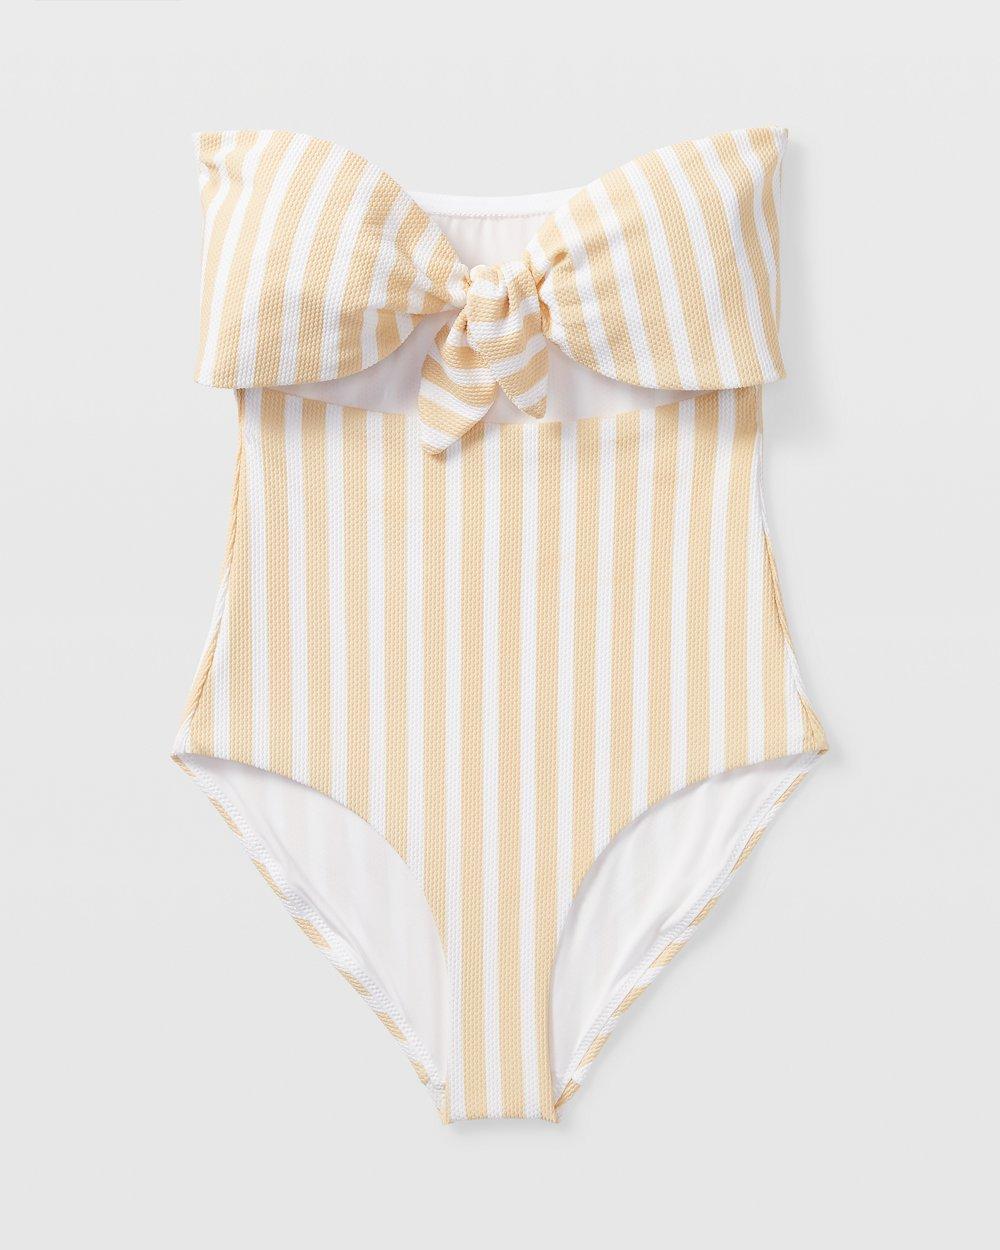 Clubmonaco Onia Marie Swimsuit